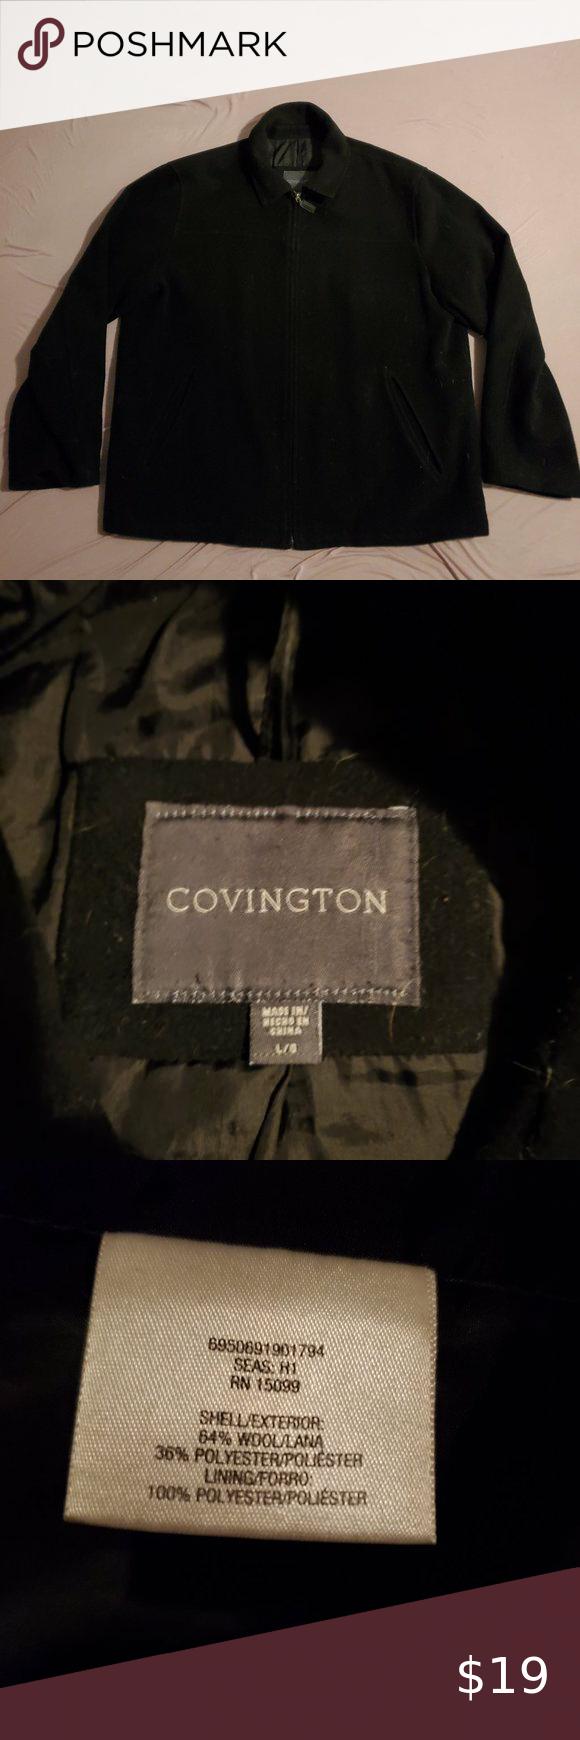 Covington Zip Wool Bomber Insulated Winter Jacket Winter Jackets Covington Jackets [ 1740 x 580 Pixel ]